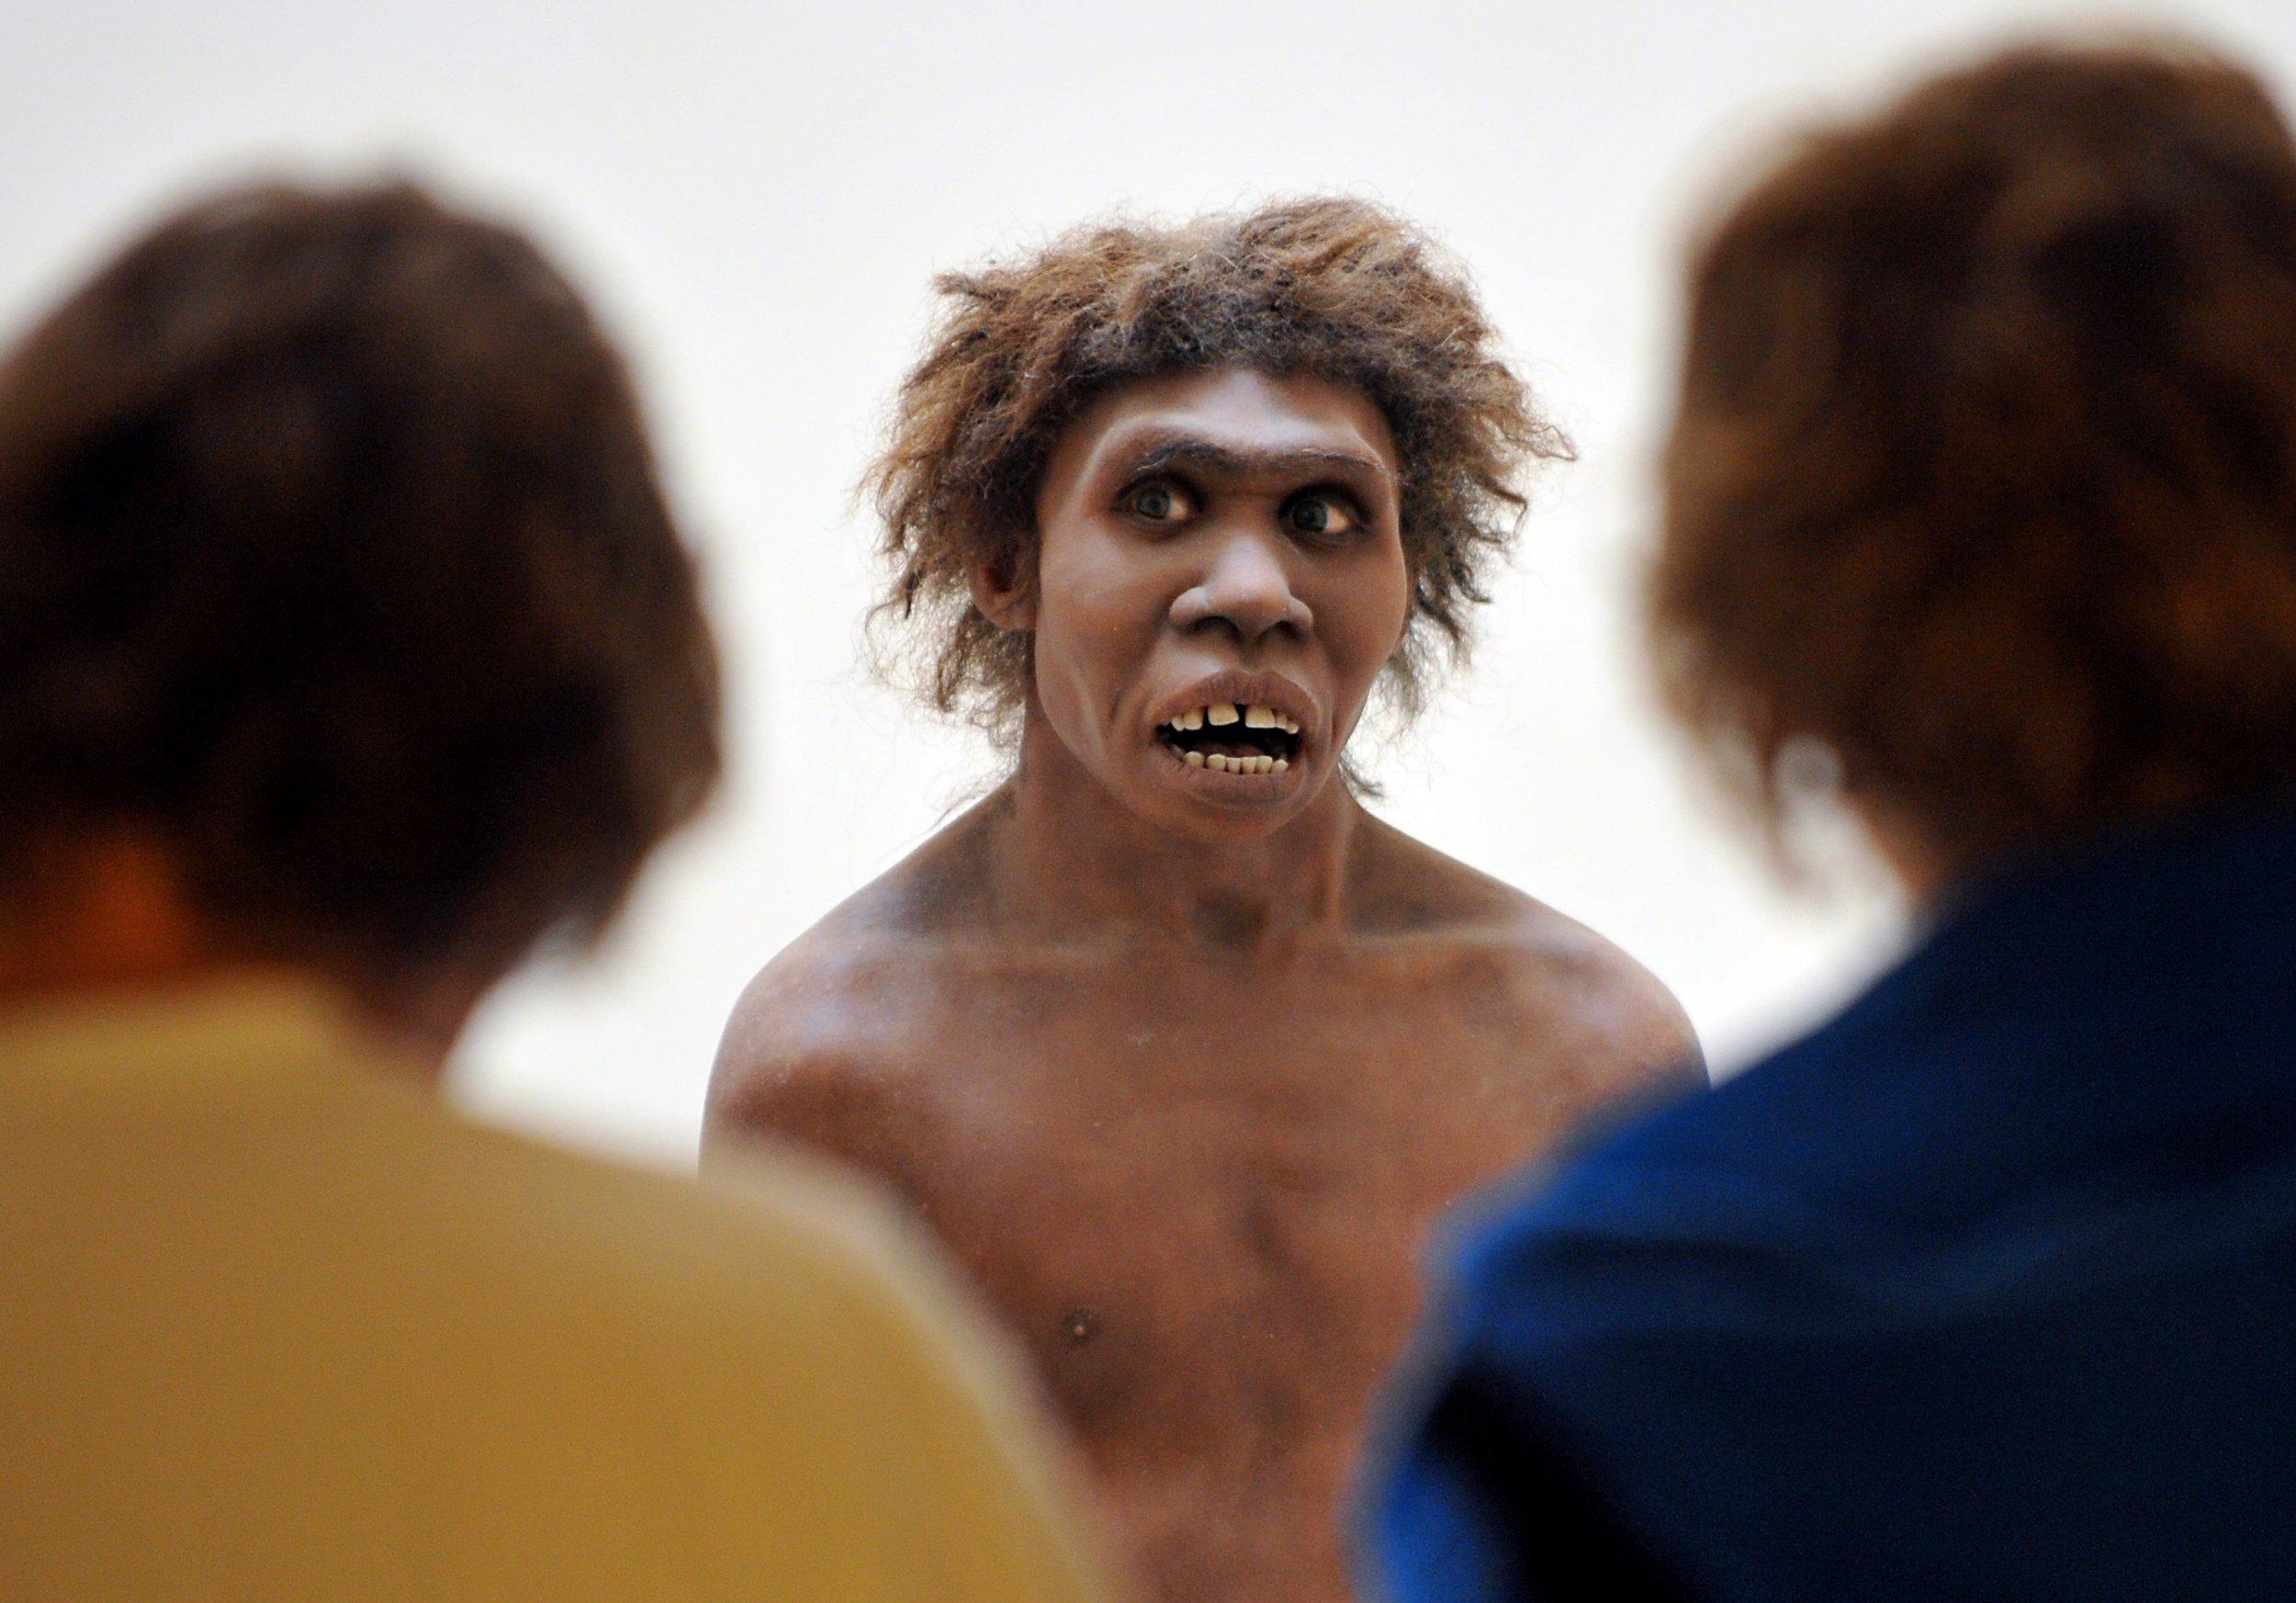 12_7_Neanderthal Man